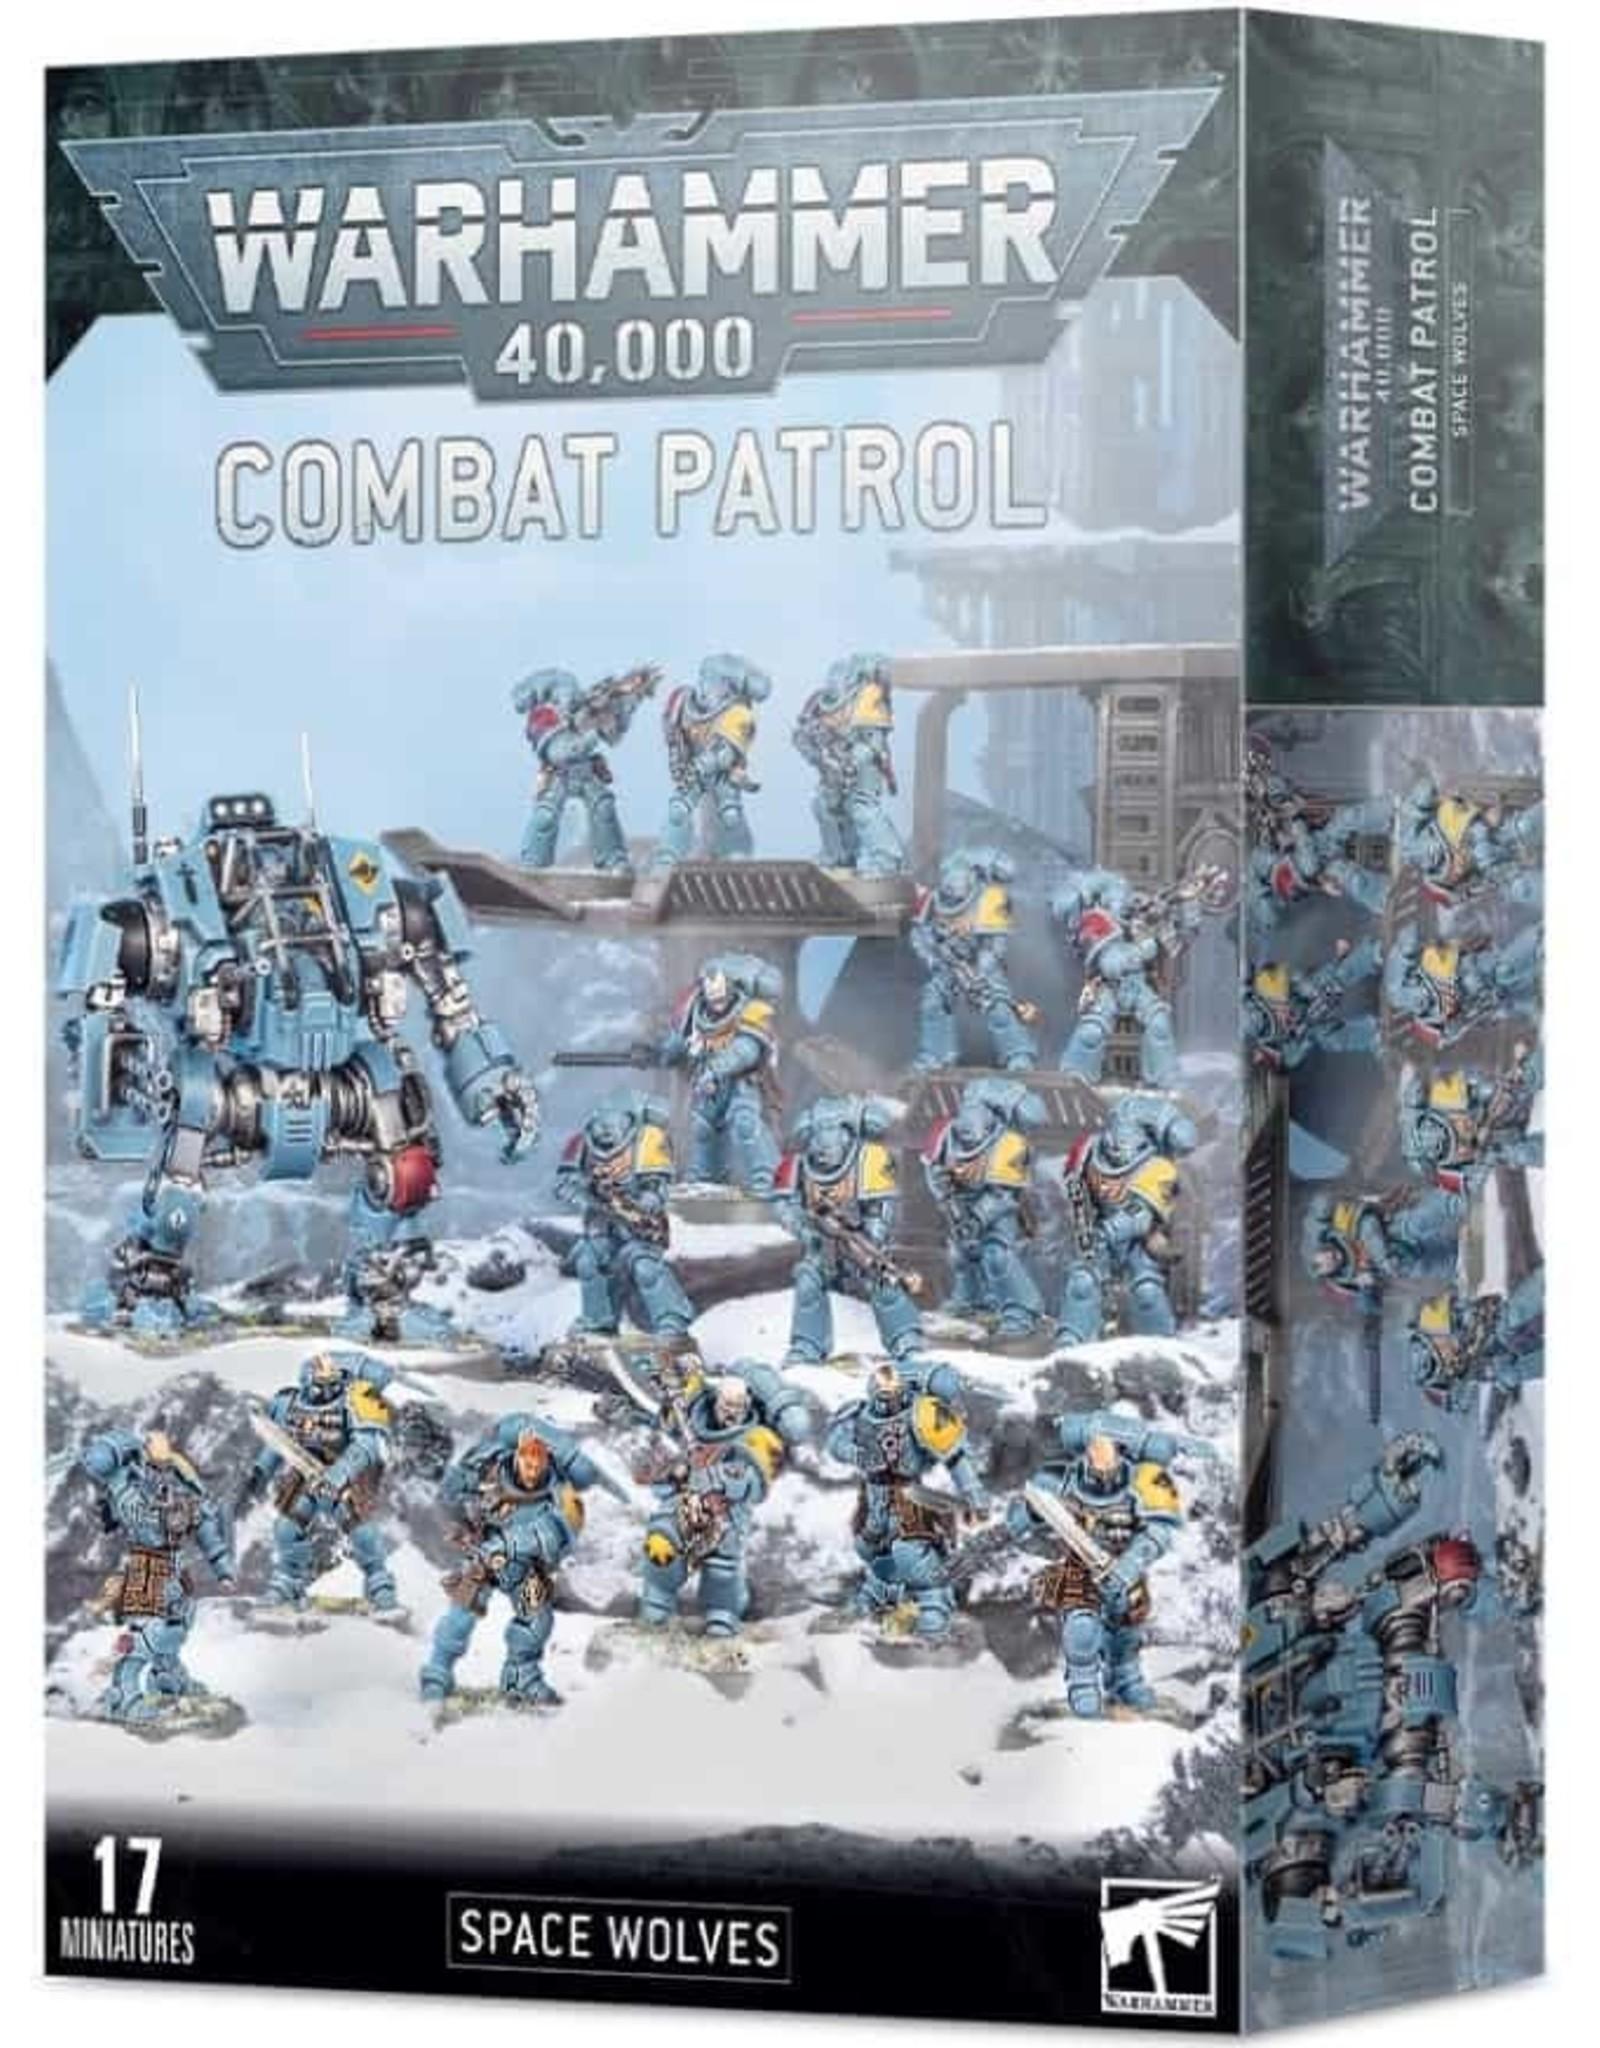 Warhammer 40K Combat Patrol: Space Wolves